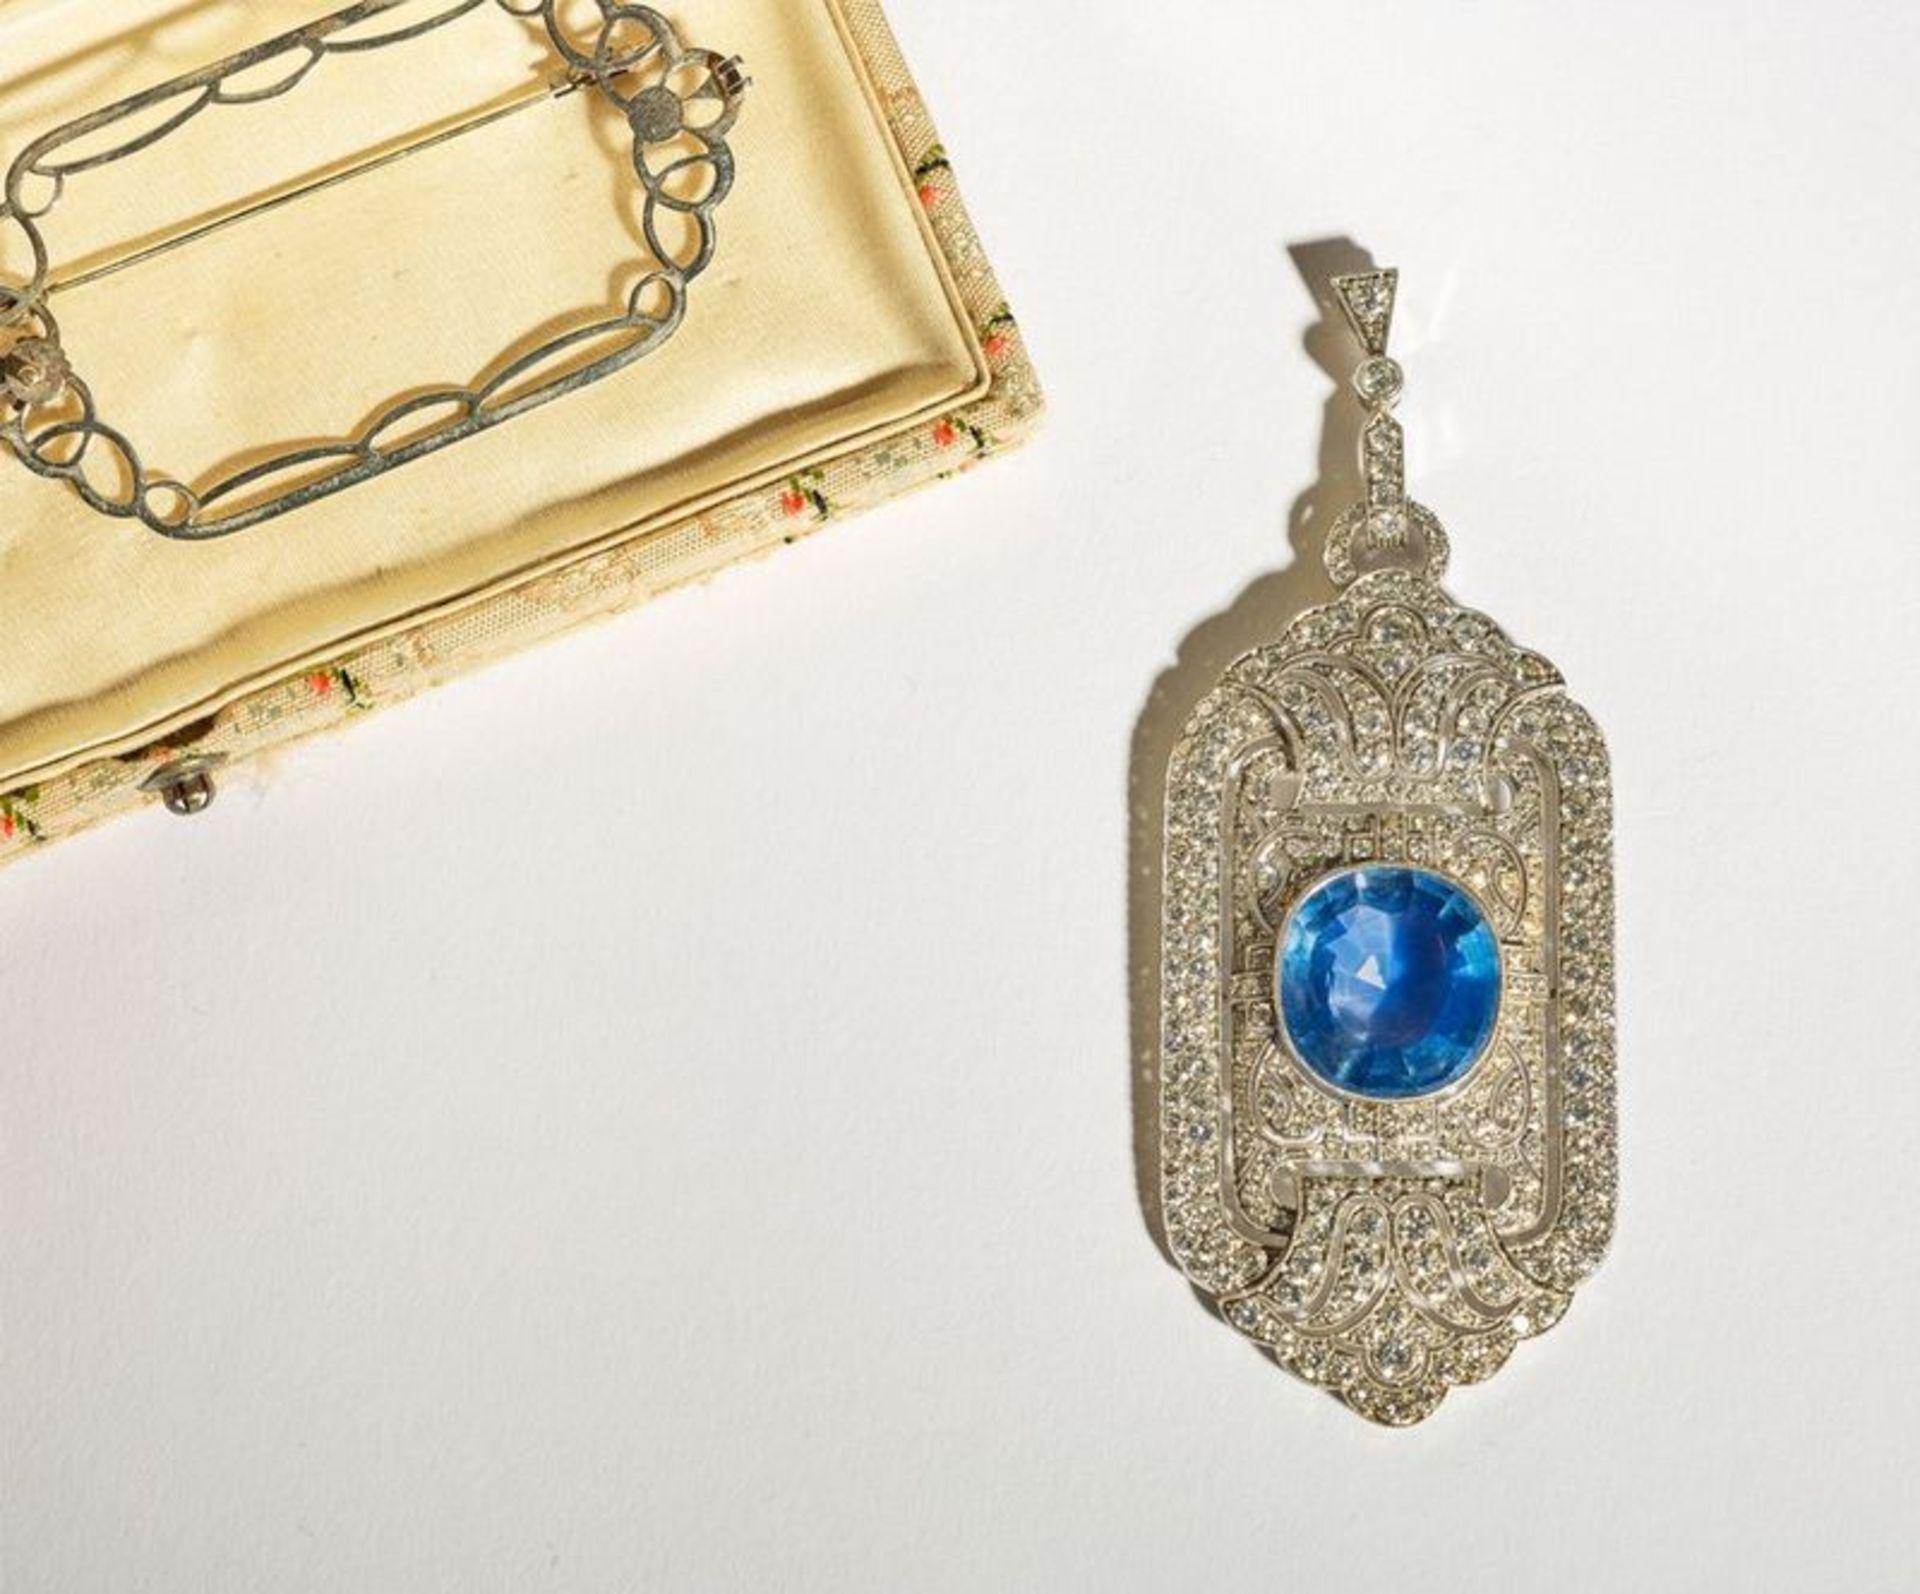 ART DECO SAPPHIRE AND PLATINUM PENDANT - Ceylon sapphire, diamonds. with CISGEM [...]